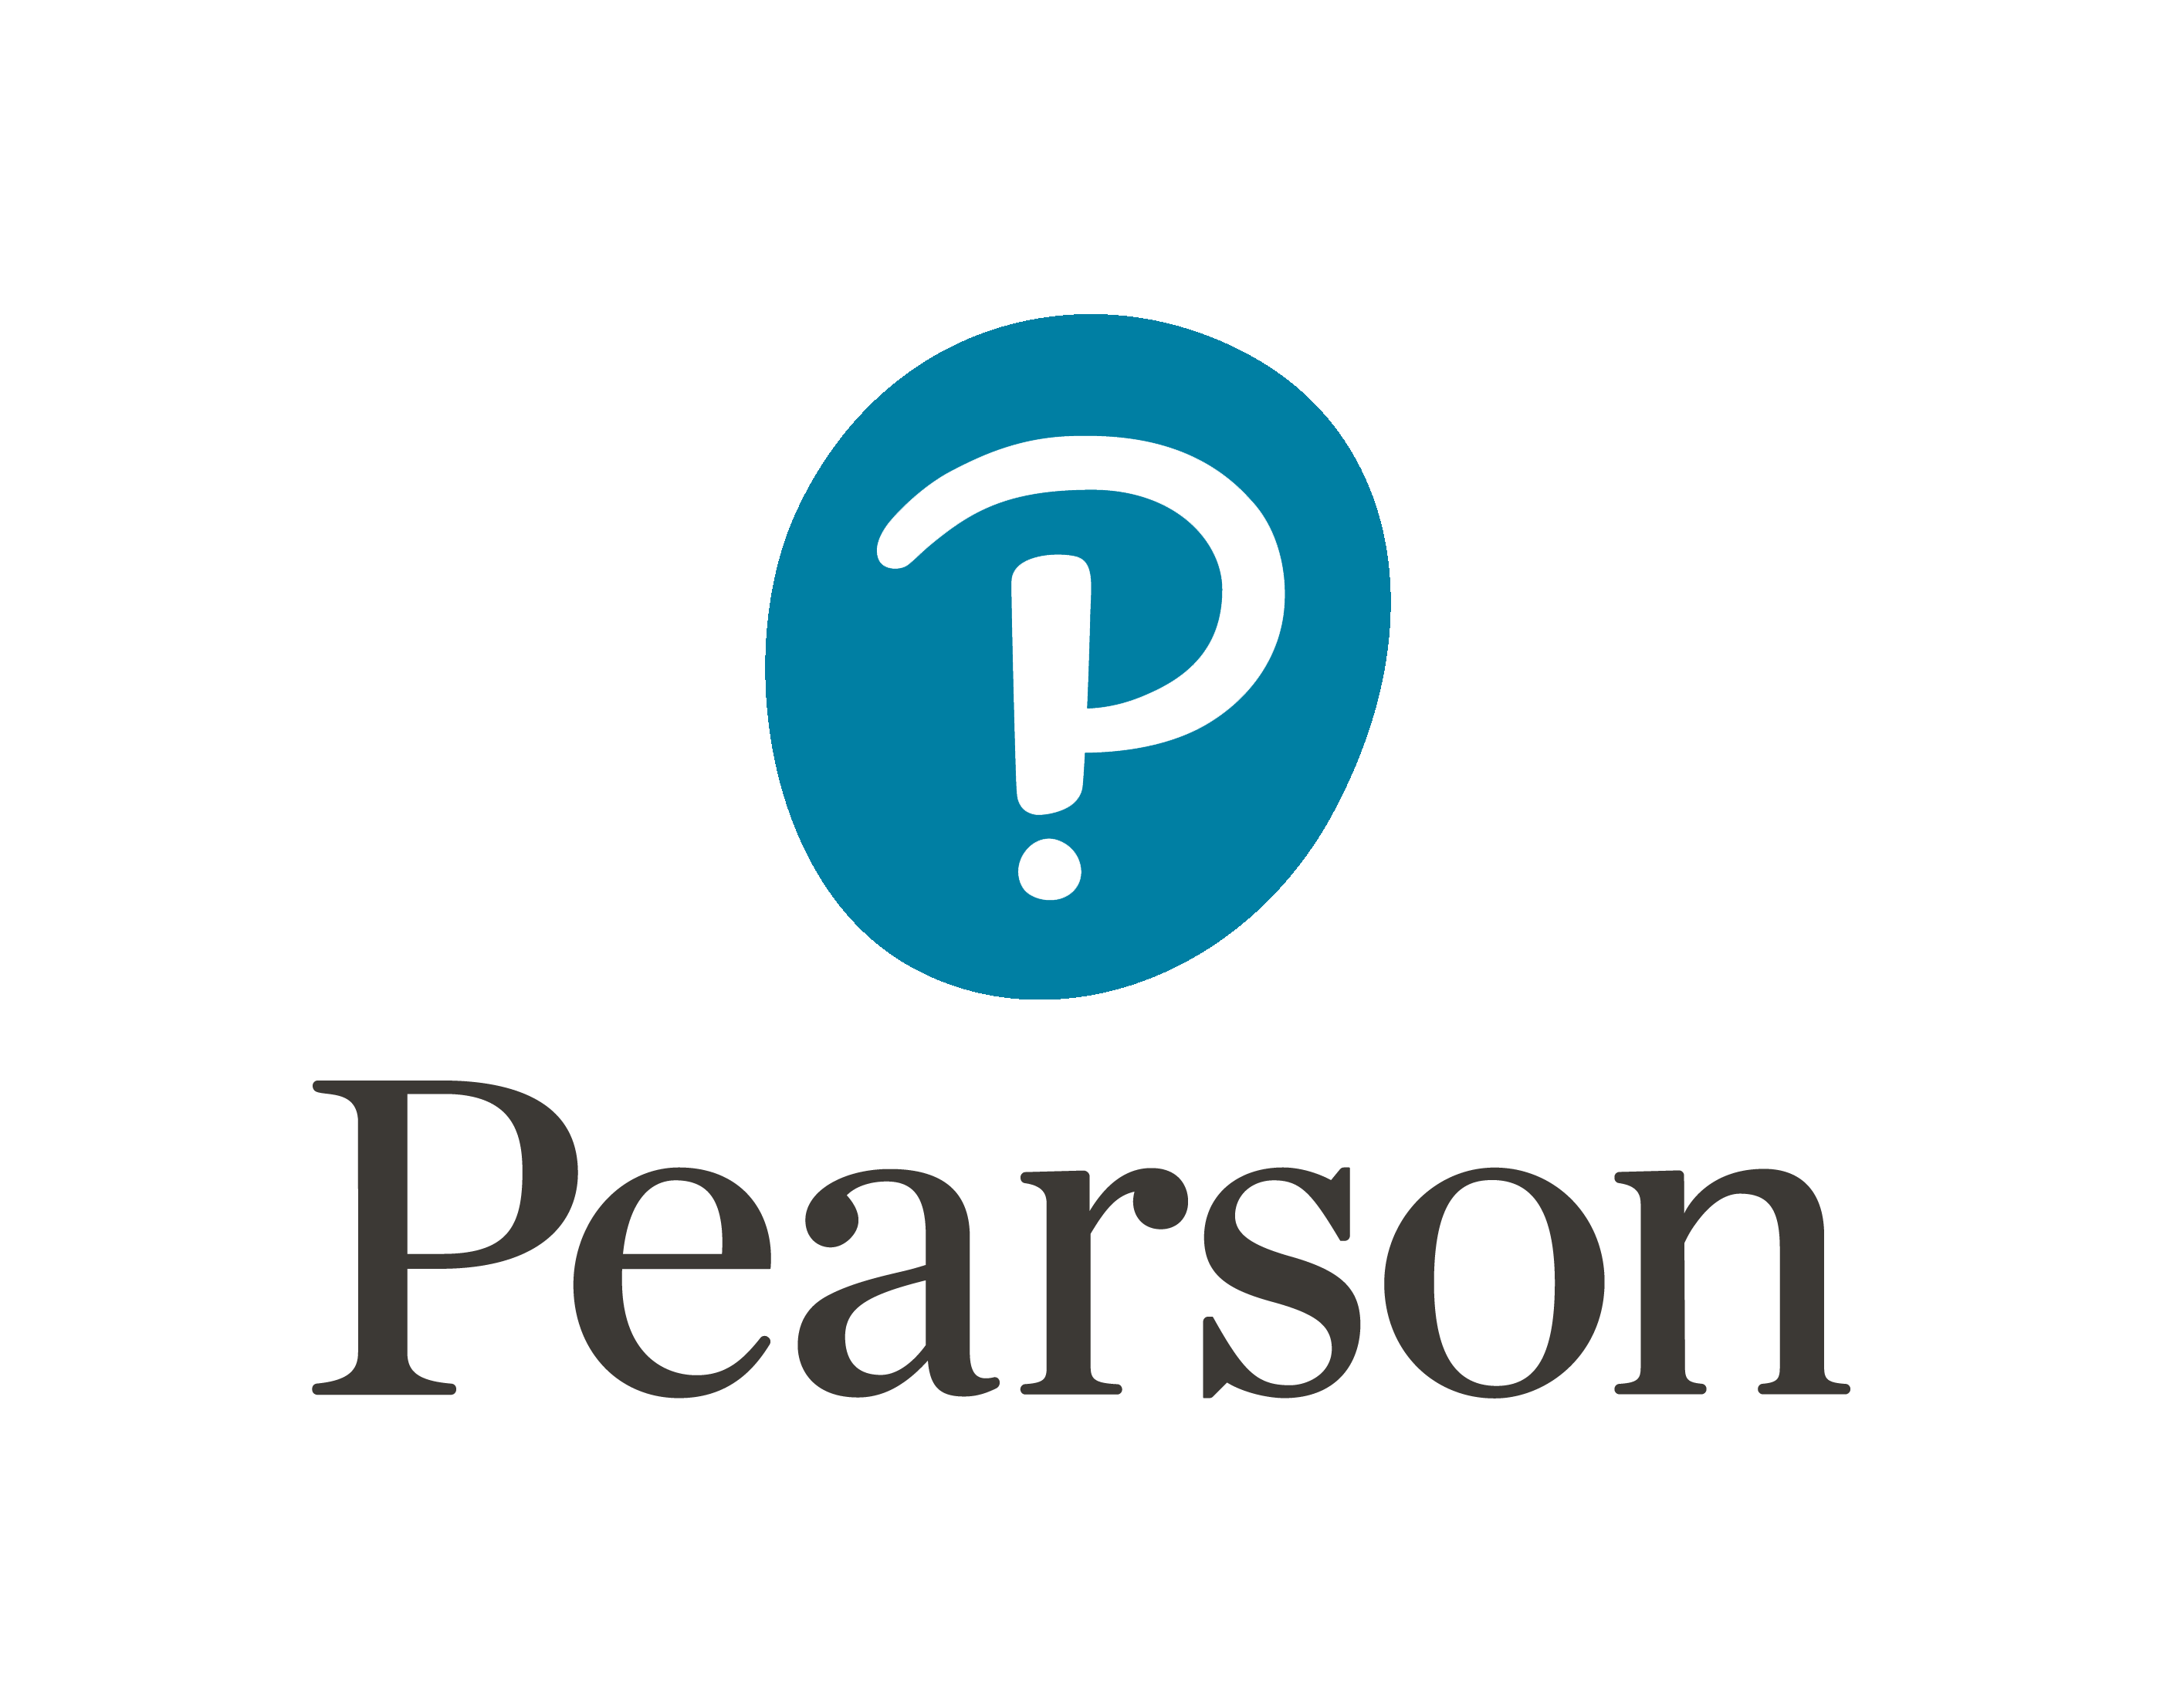 pearson essayscorer   student login pearson essayscorer user authentication warning page